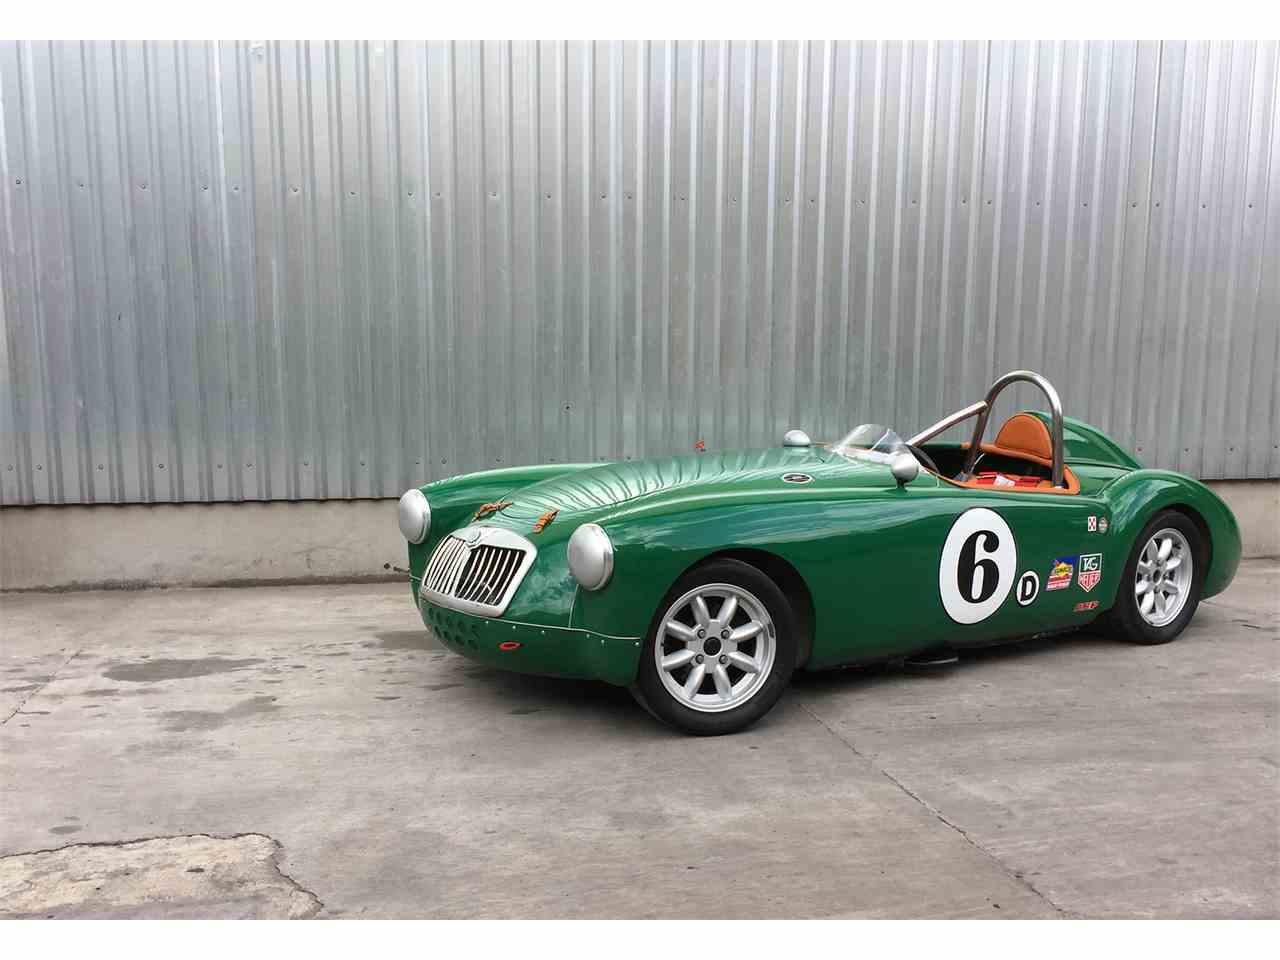 1958 MG MGA Racecar for Sale | ClassicCars.com | CC-1008163